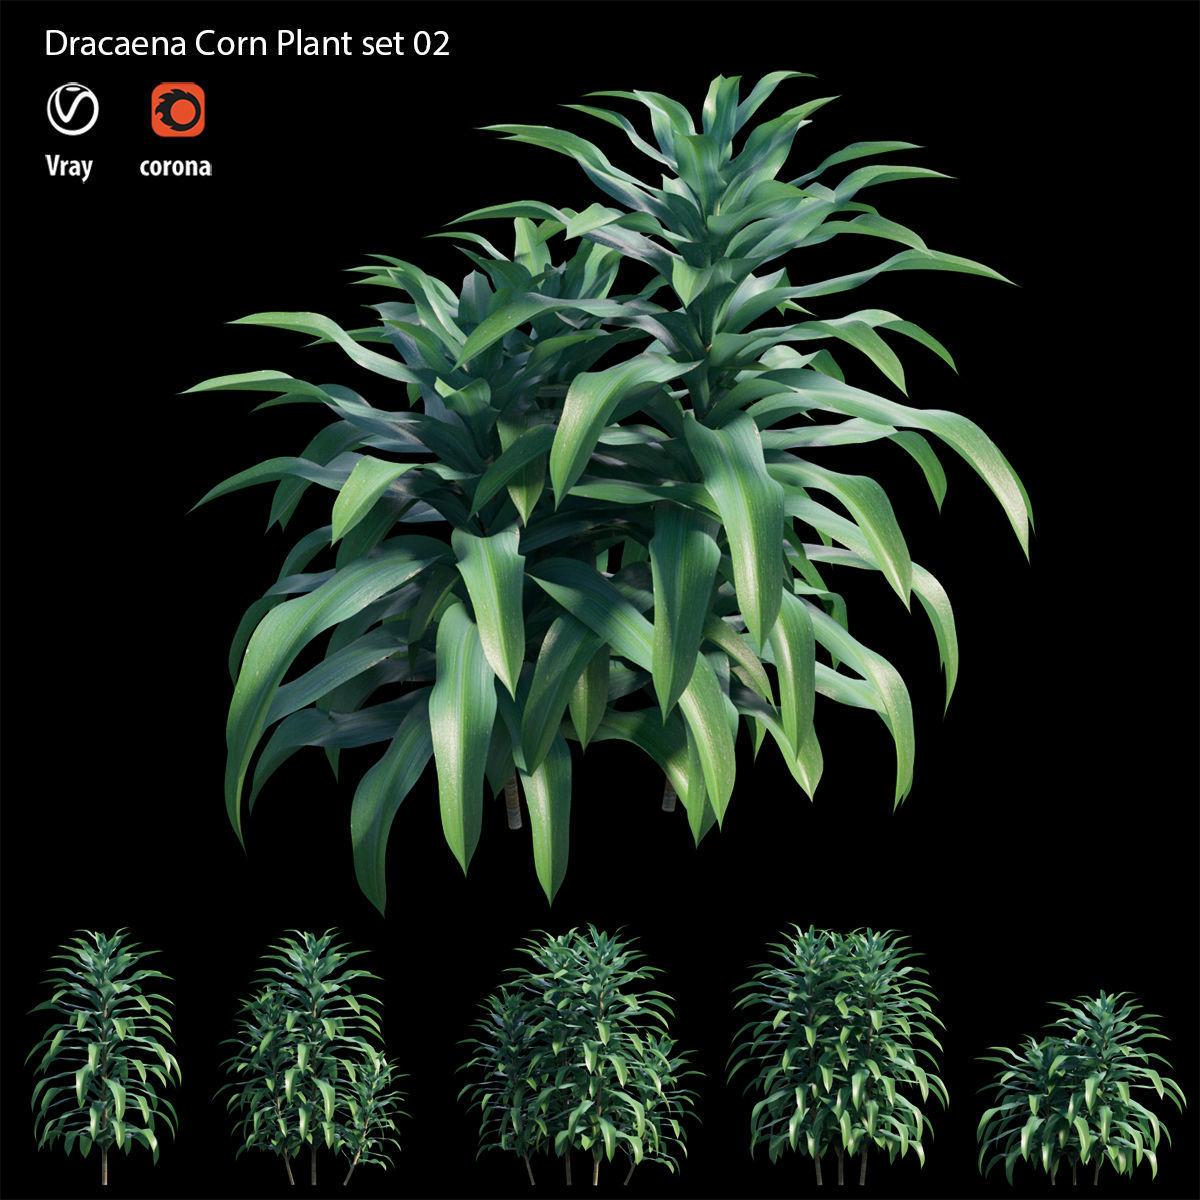 Dracaena Corn Plant set 02